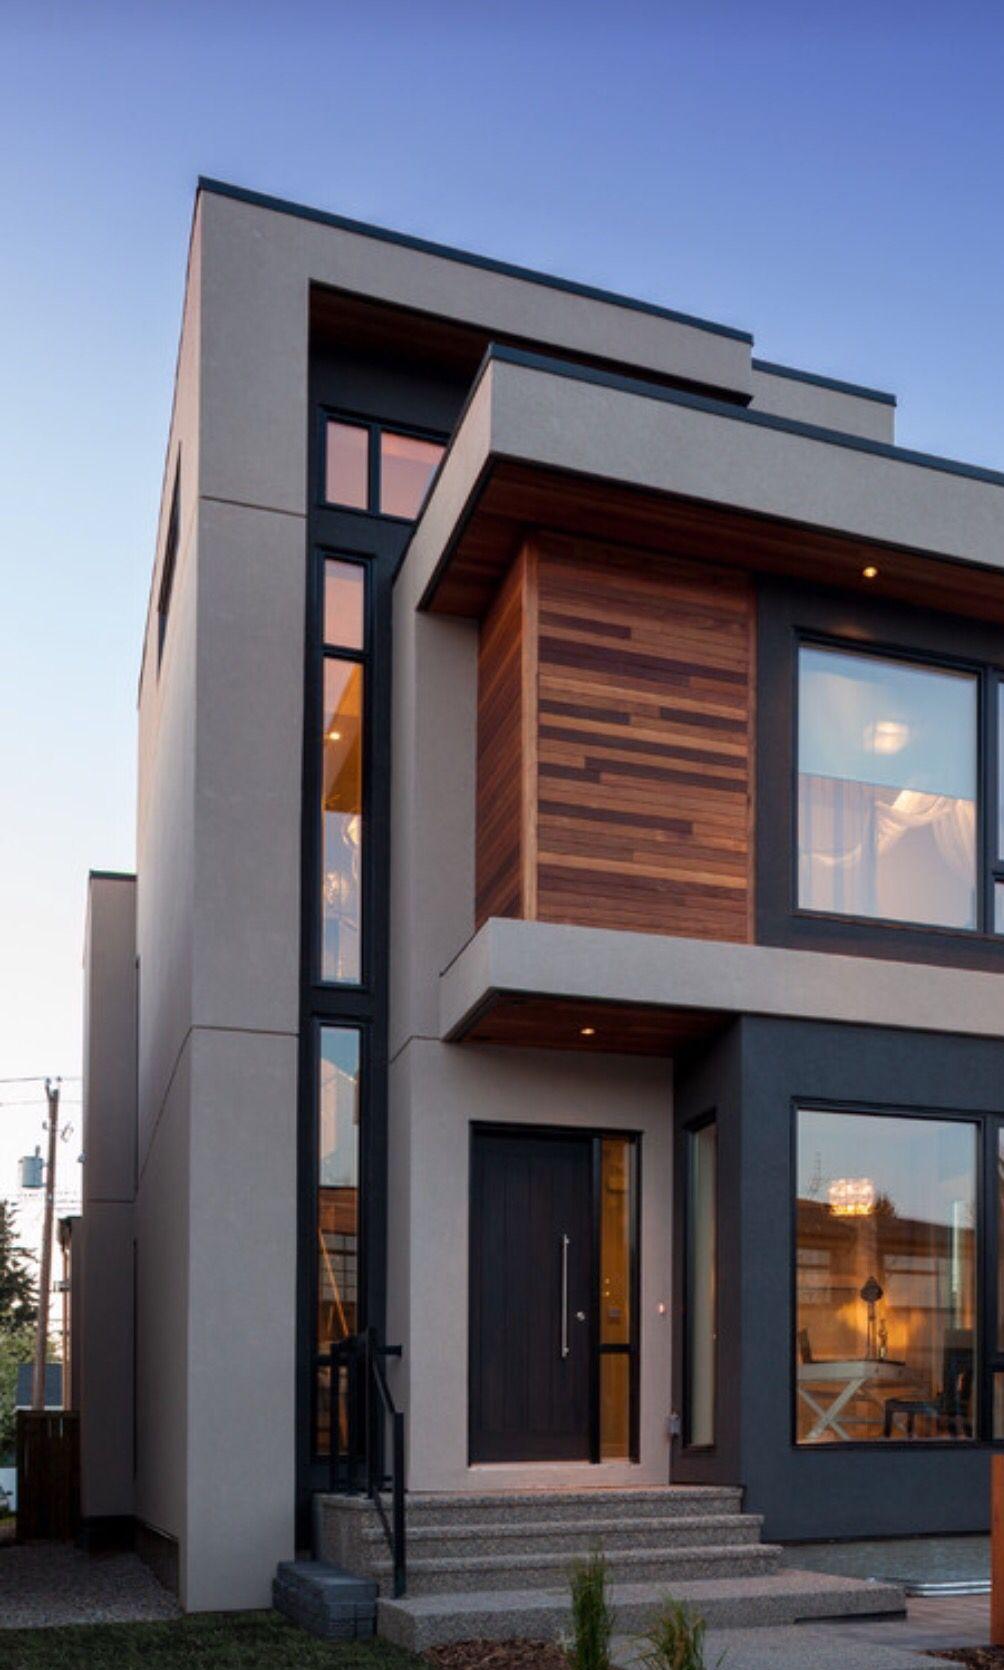 ✓47 Popular Contemporary Exterior House Design Ideas 10 | Stair Room Exterior Design | 3 Floor Building | Box Type | Brick | Open Plan | Amazing